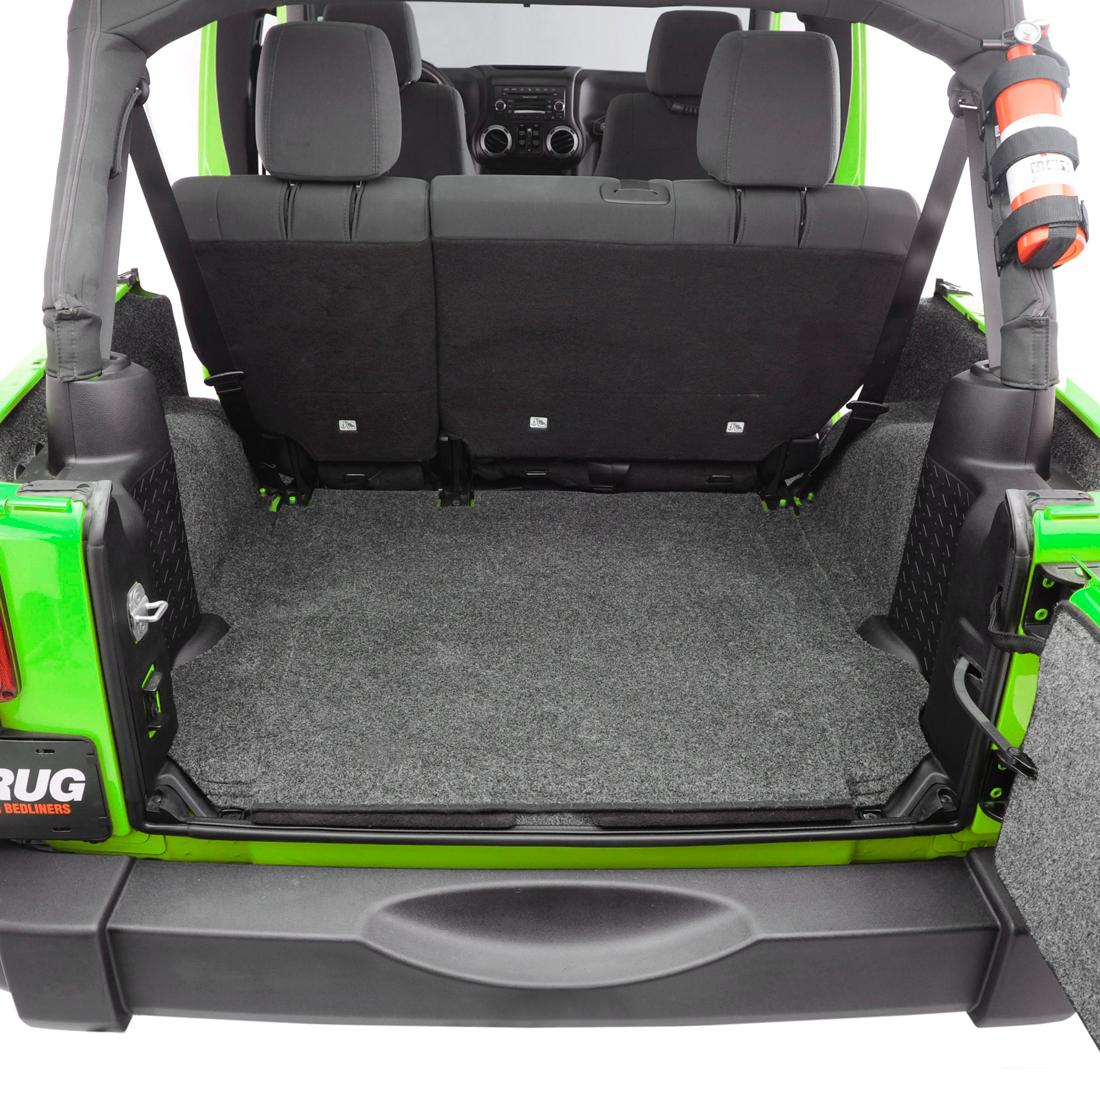 Amazon.com: Bedrug BRTJ97R Rear Cargo Liner Kit For Jeep